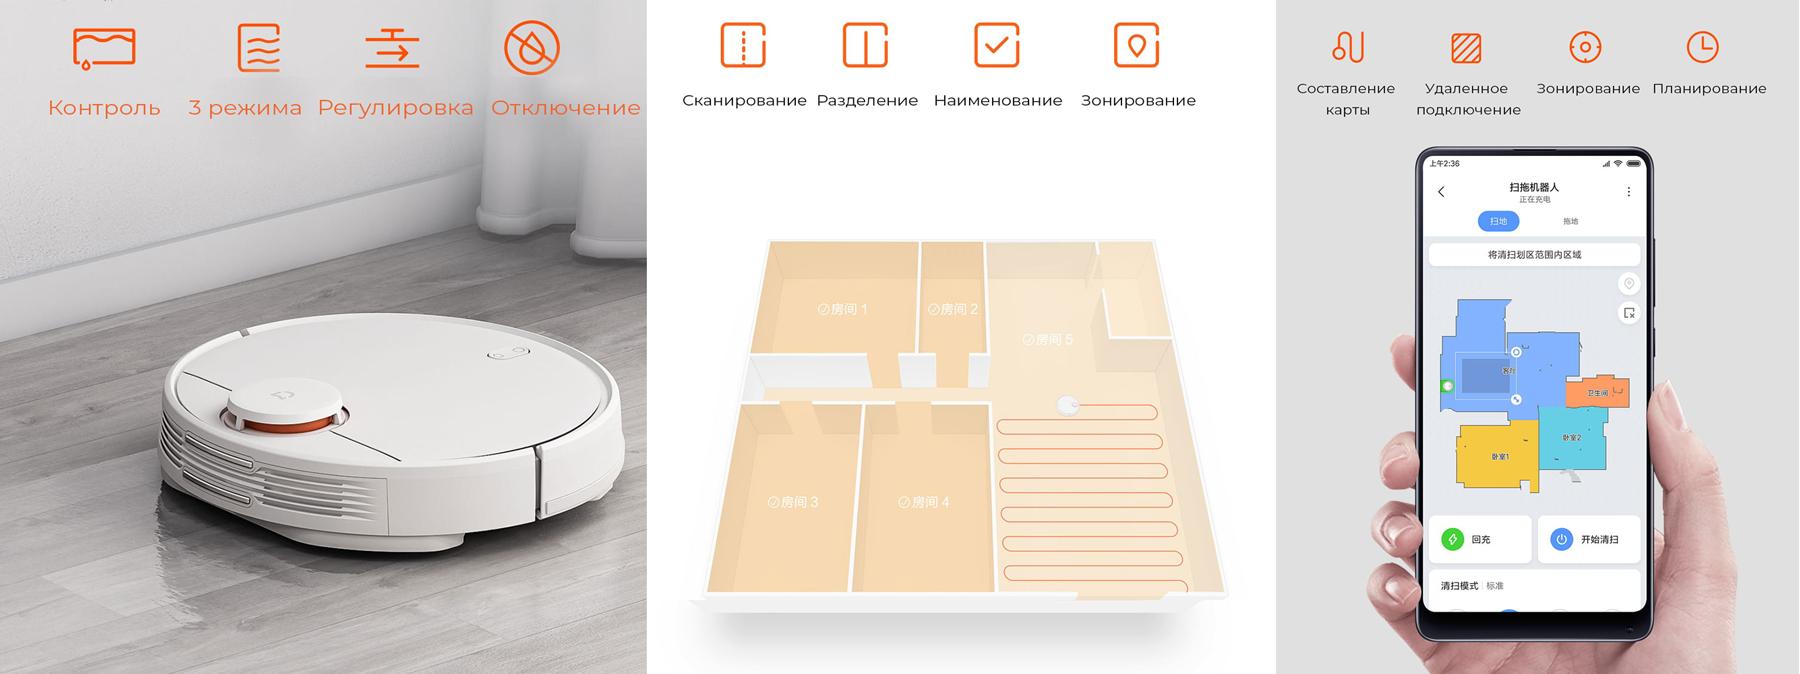 Преимущества робота-пылесоса Xiaomi Mijia LDS Vacuum Cleaner